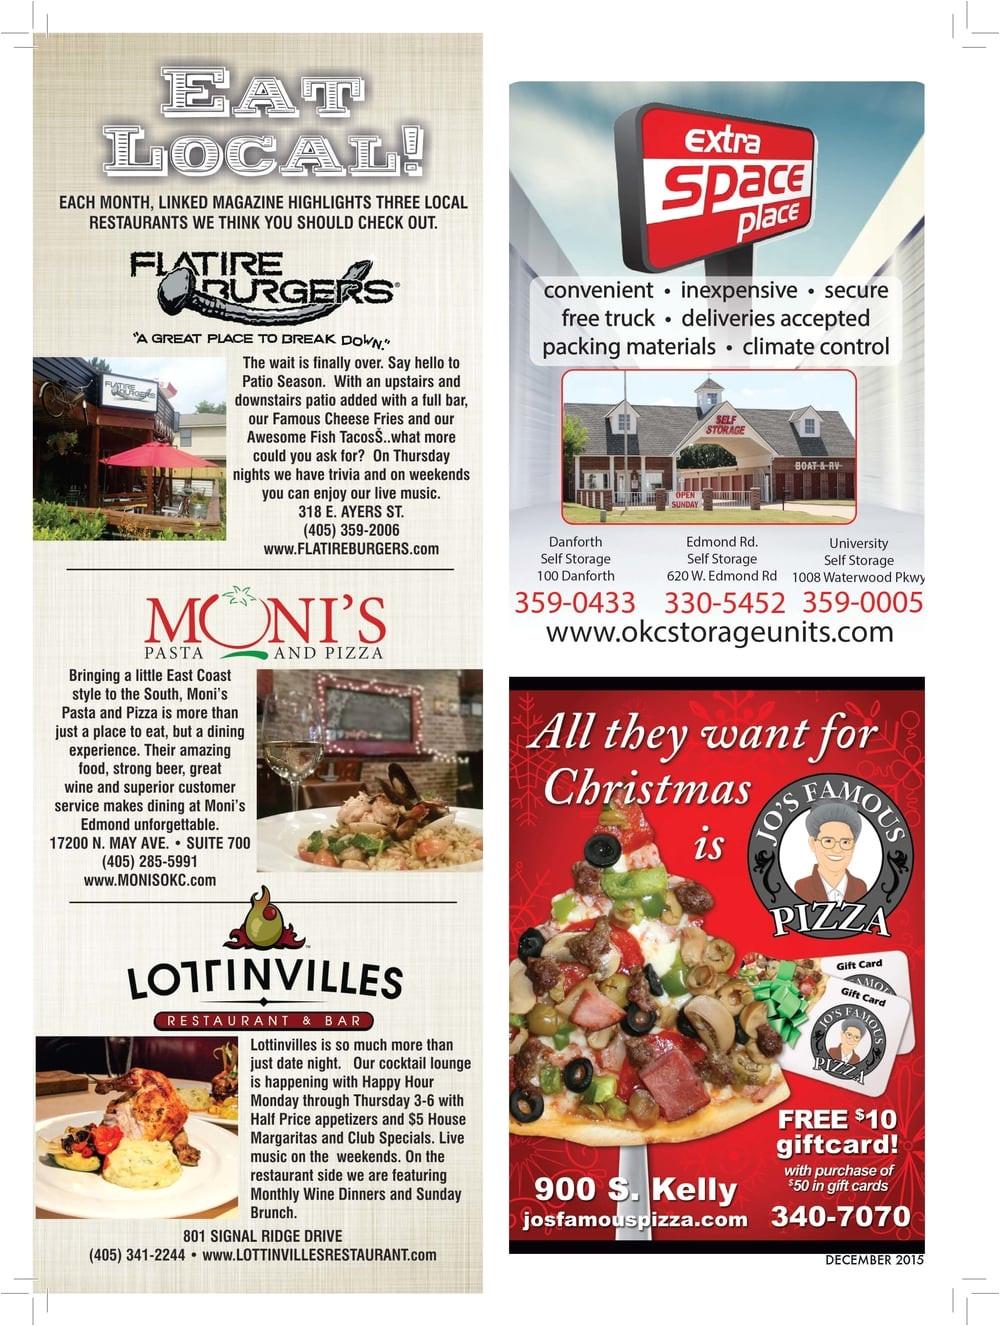 north edmond december final page 22 jpg